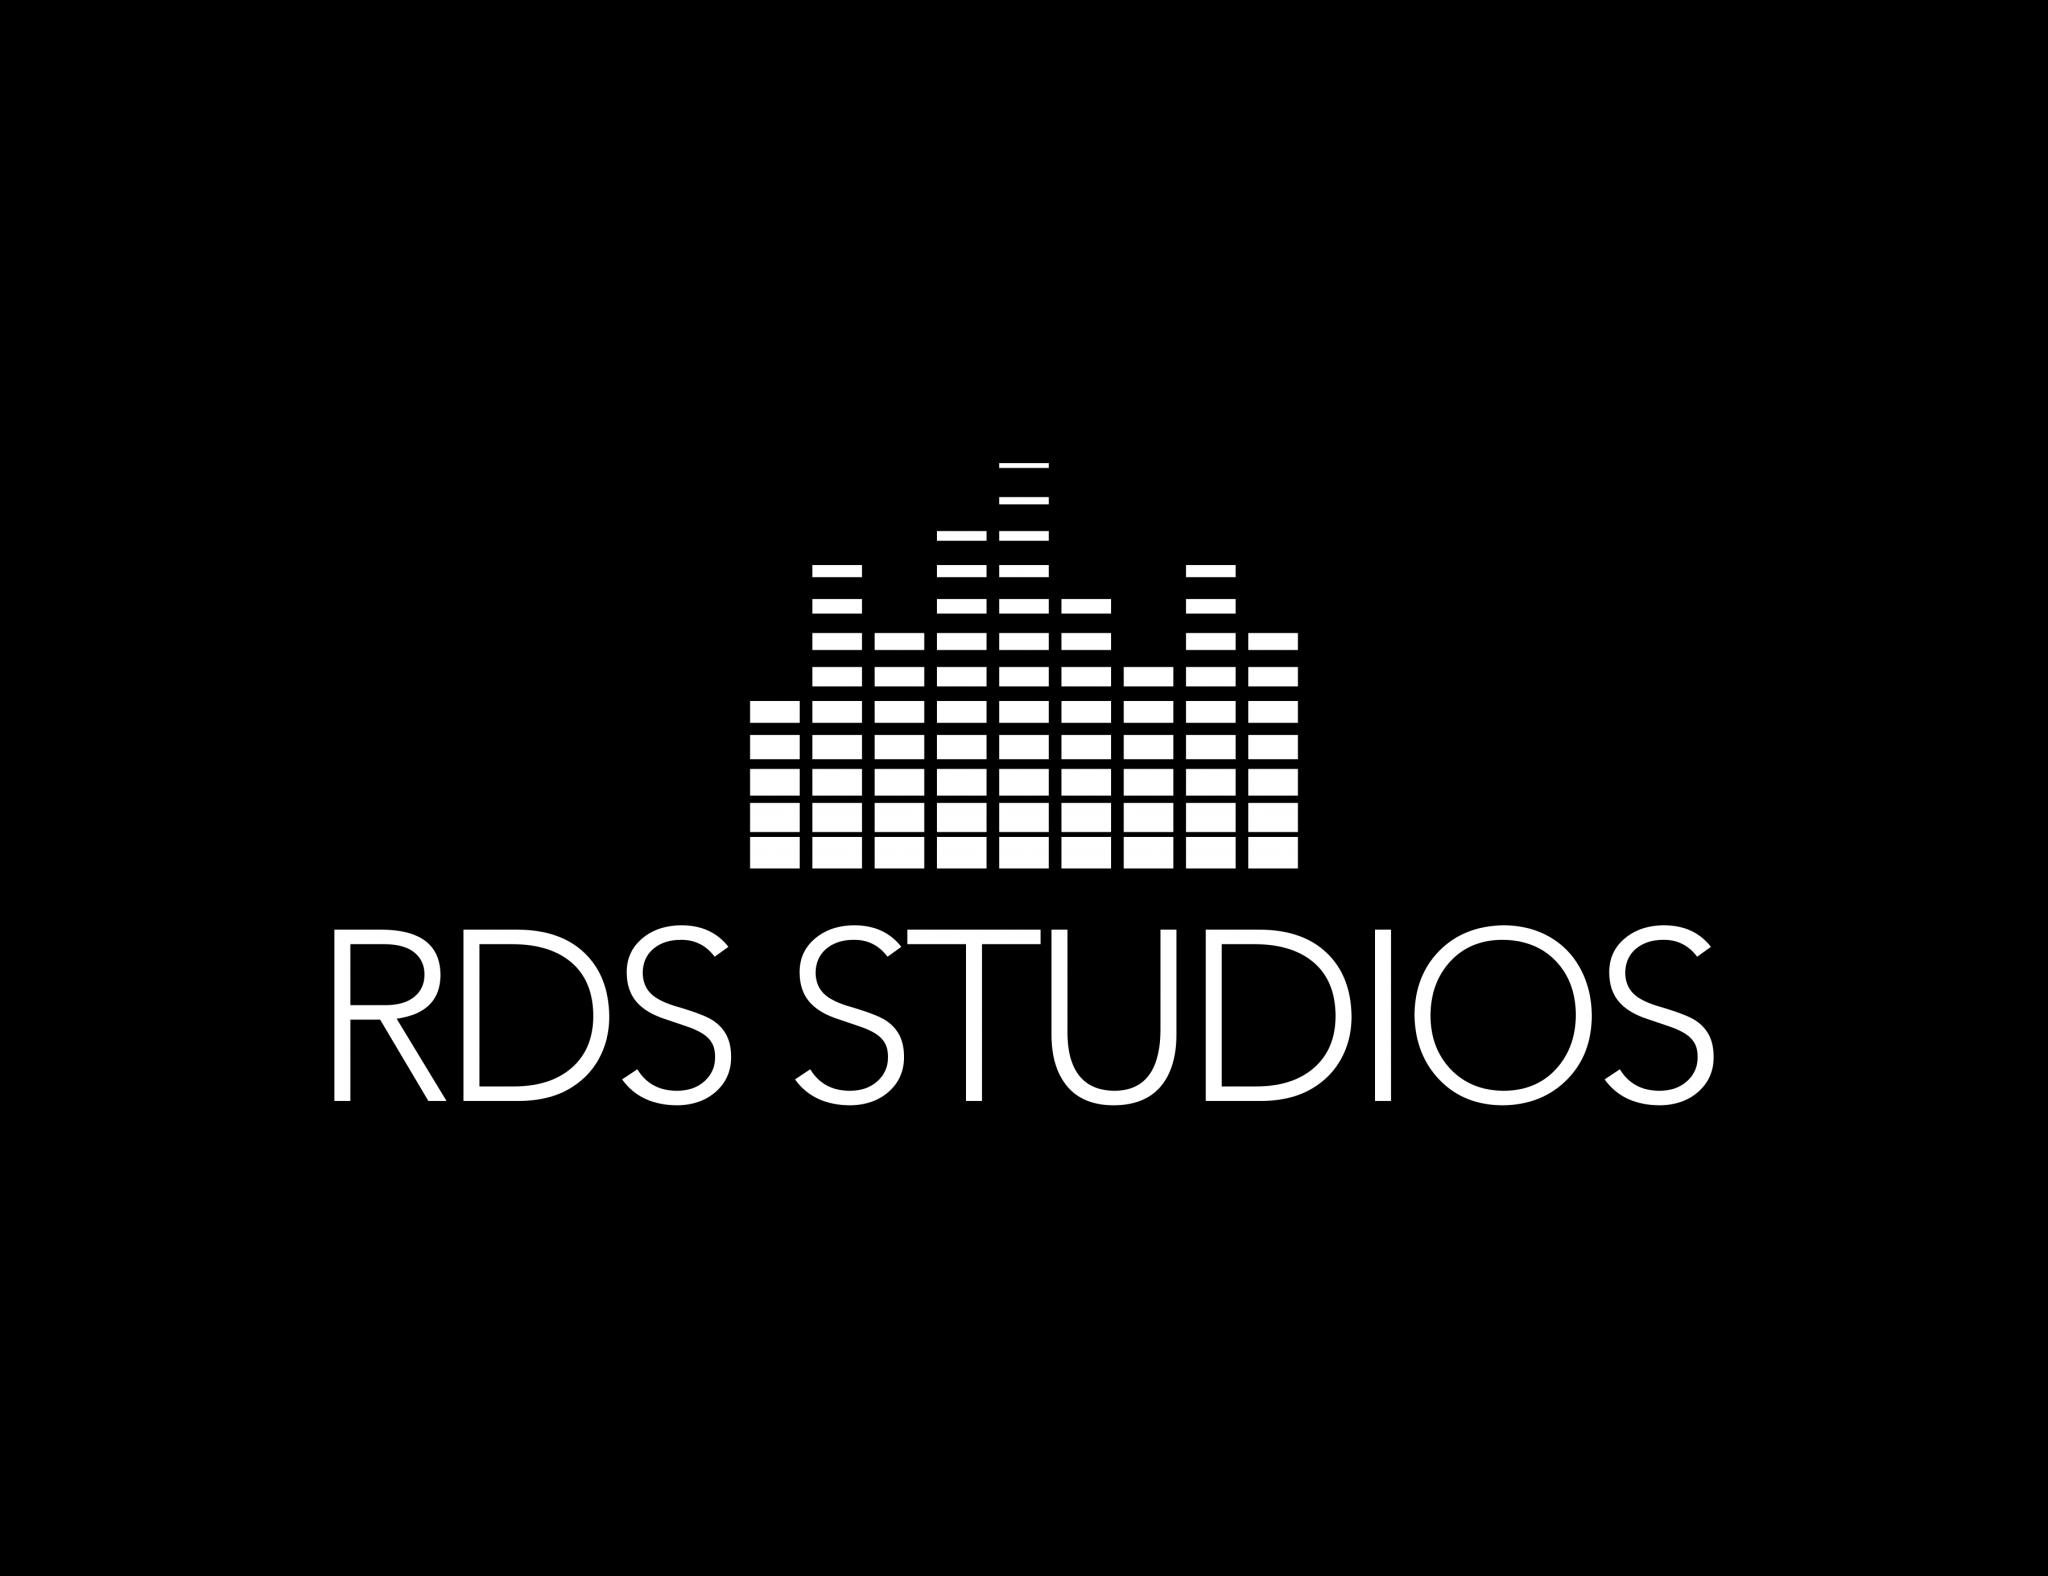 Rds Studios Logo Music Studio Brand Wave Lengths Acronym